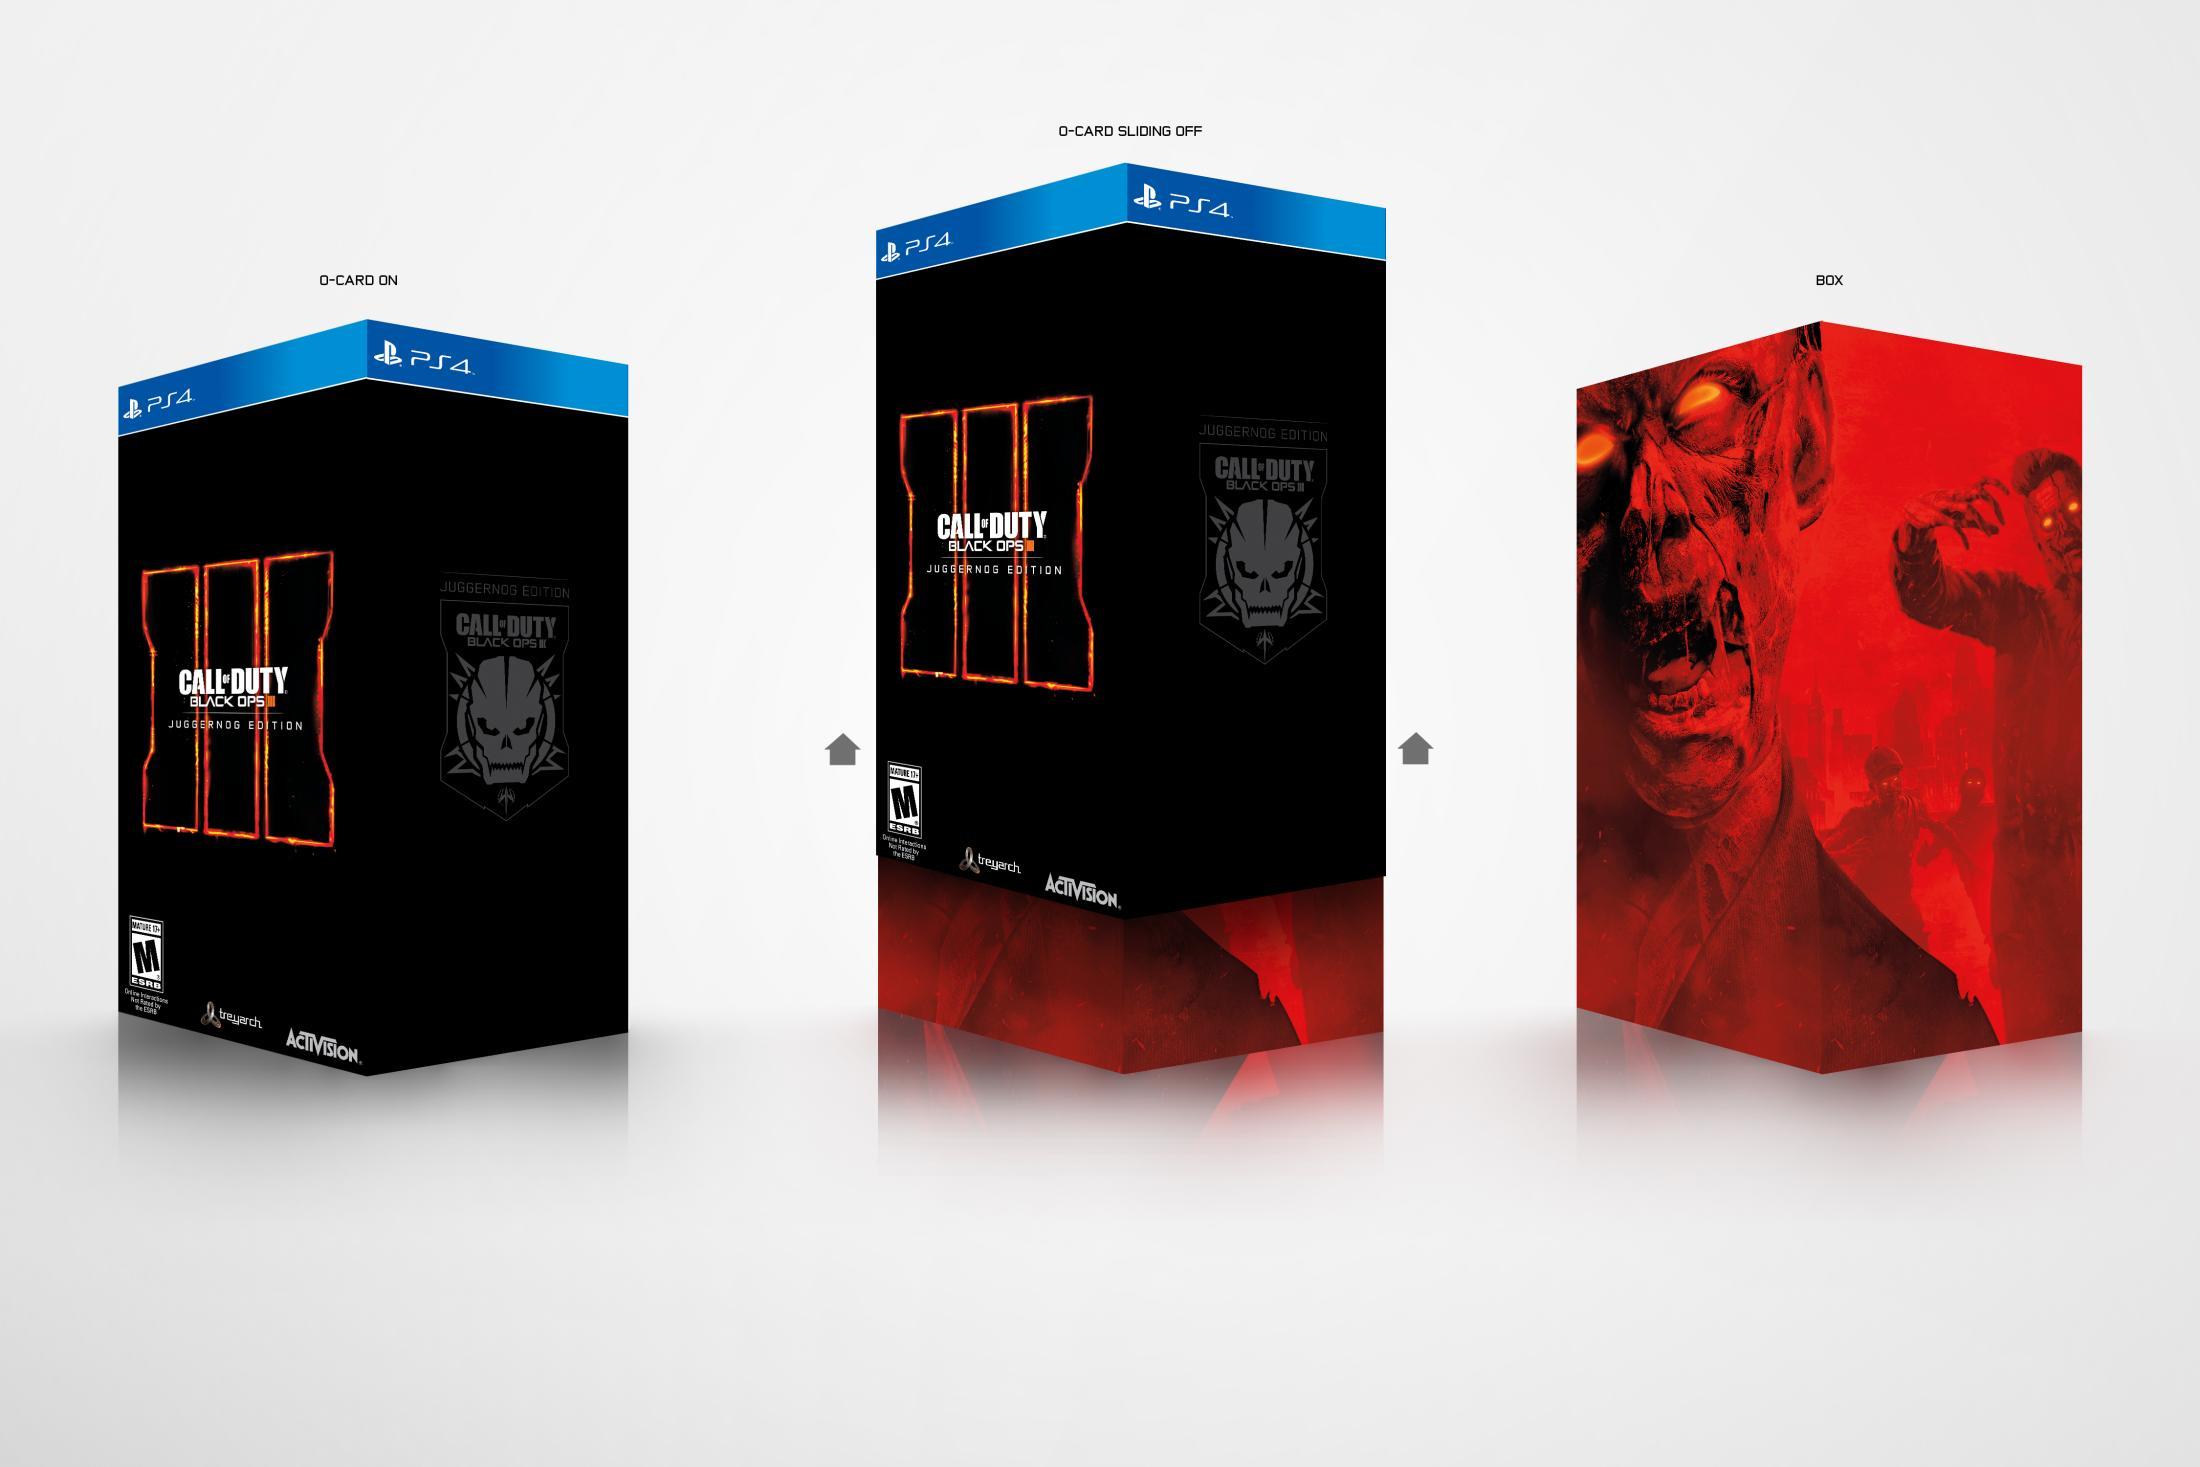 Thumbnail for Black Ops III Juggernog Edition Packaging